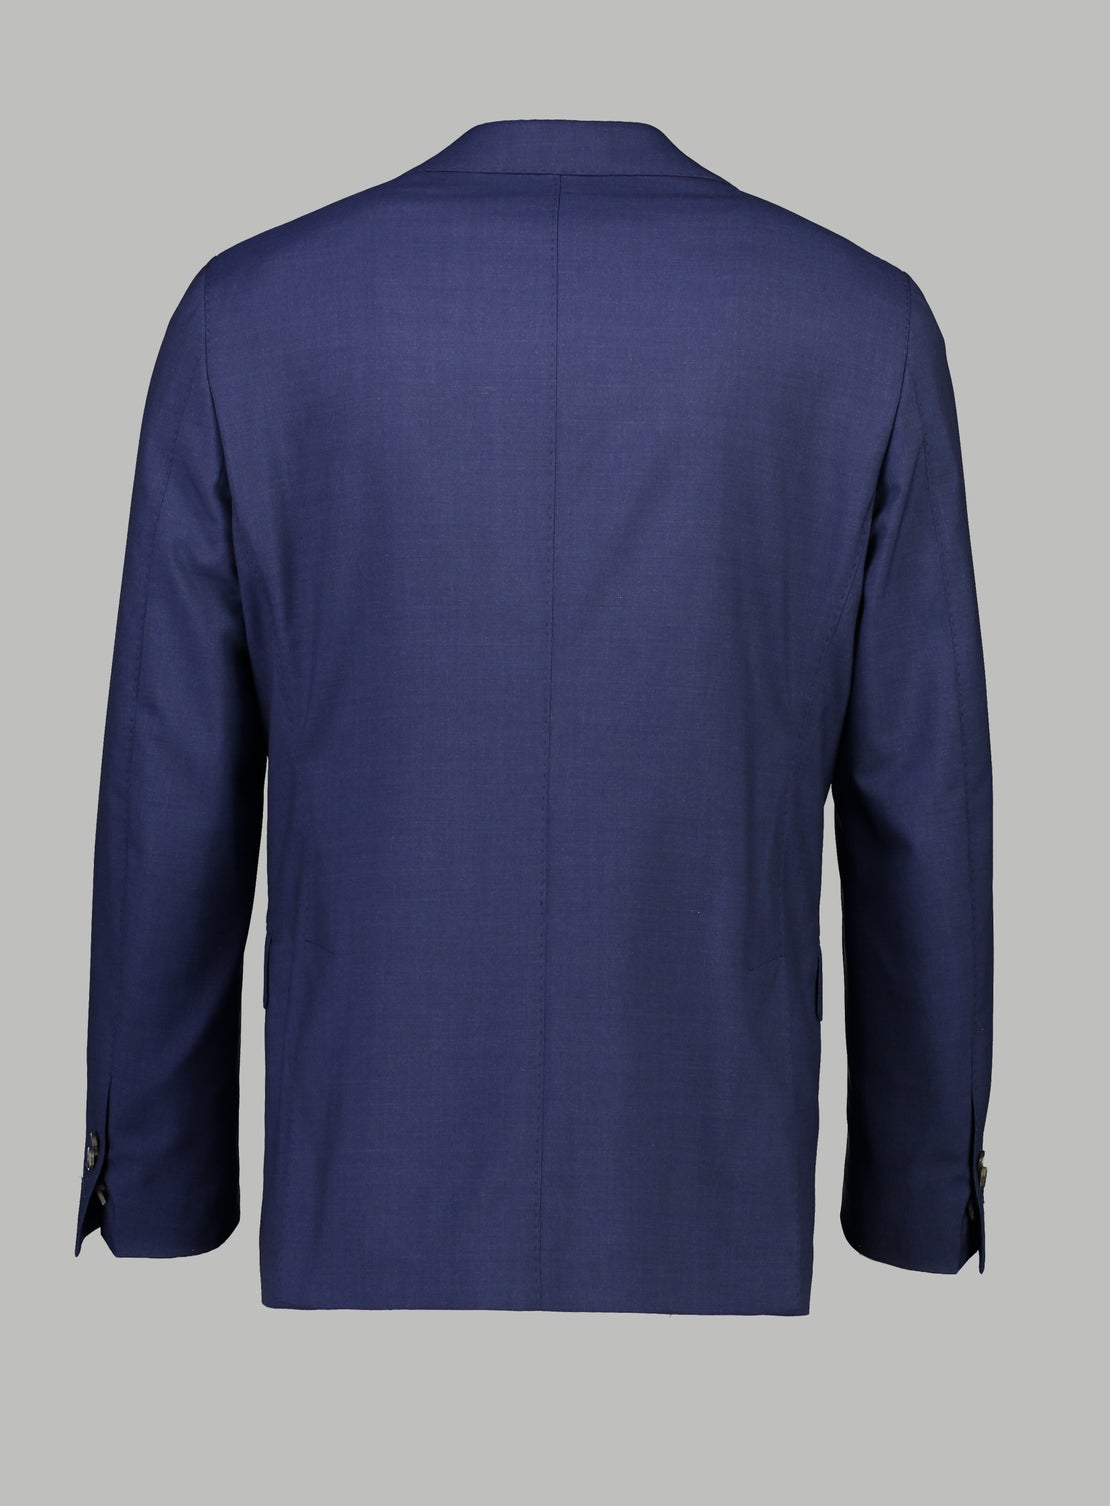 Bernardo Tropical Weave Suit